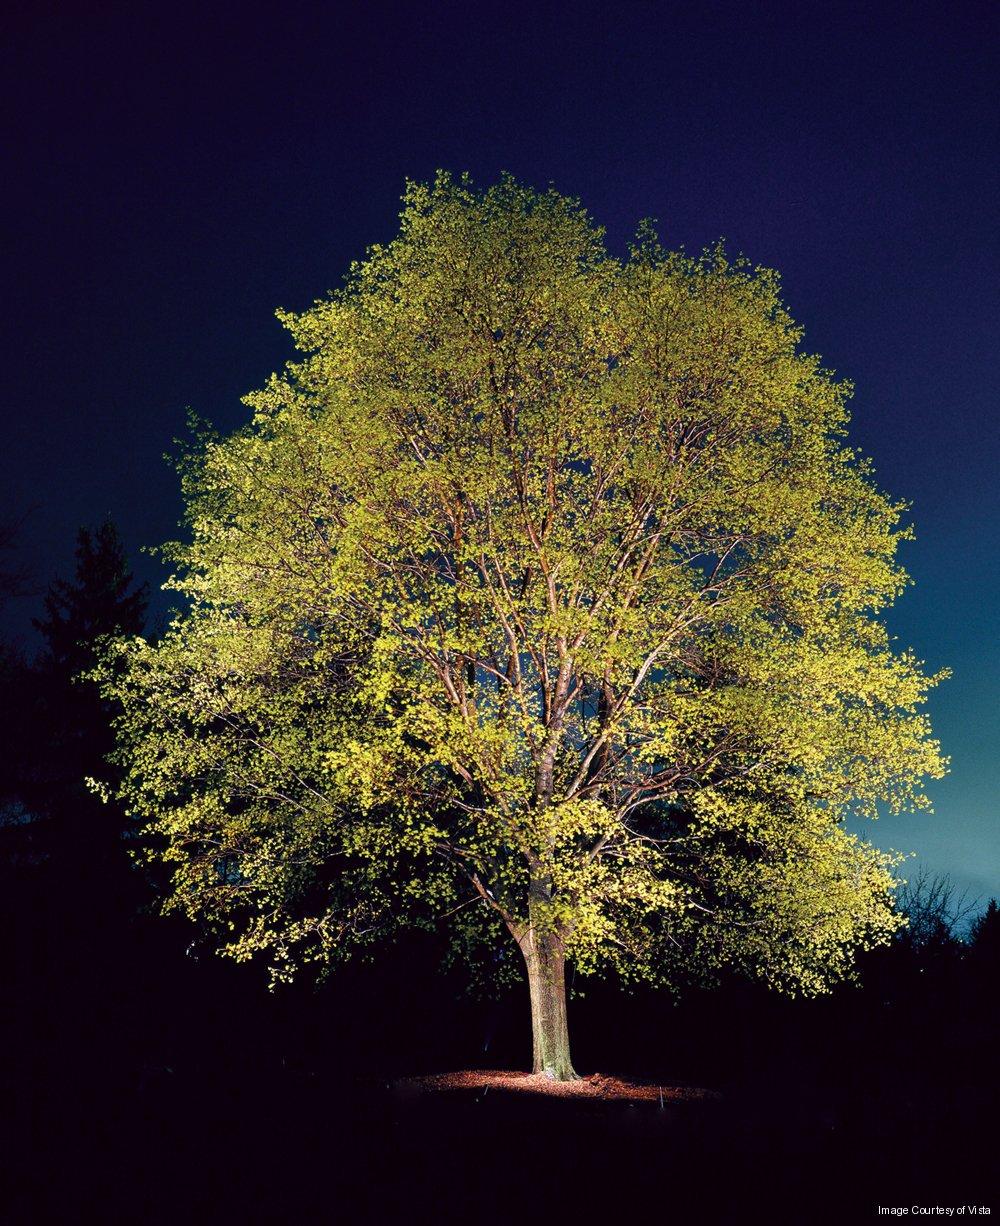 Outdoor lighting company uplighting mirror lighting for Outdoor lighting companies